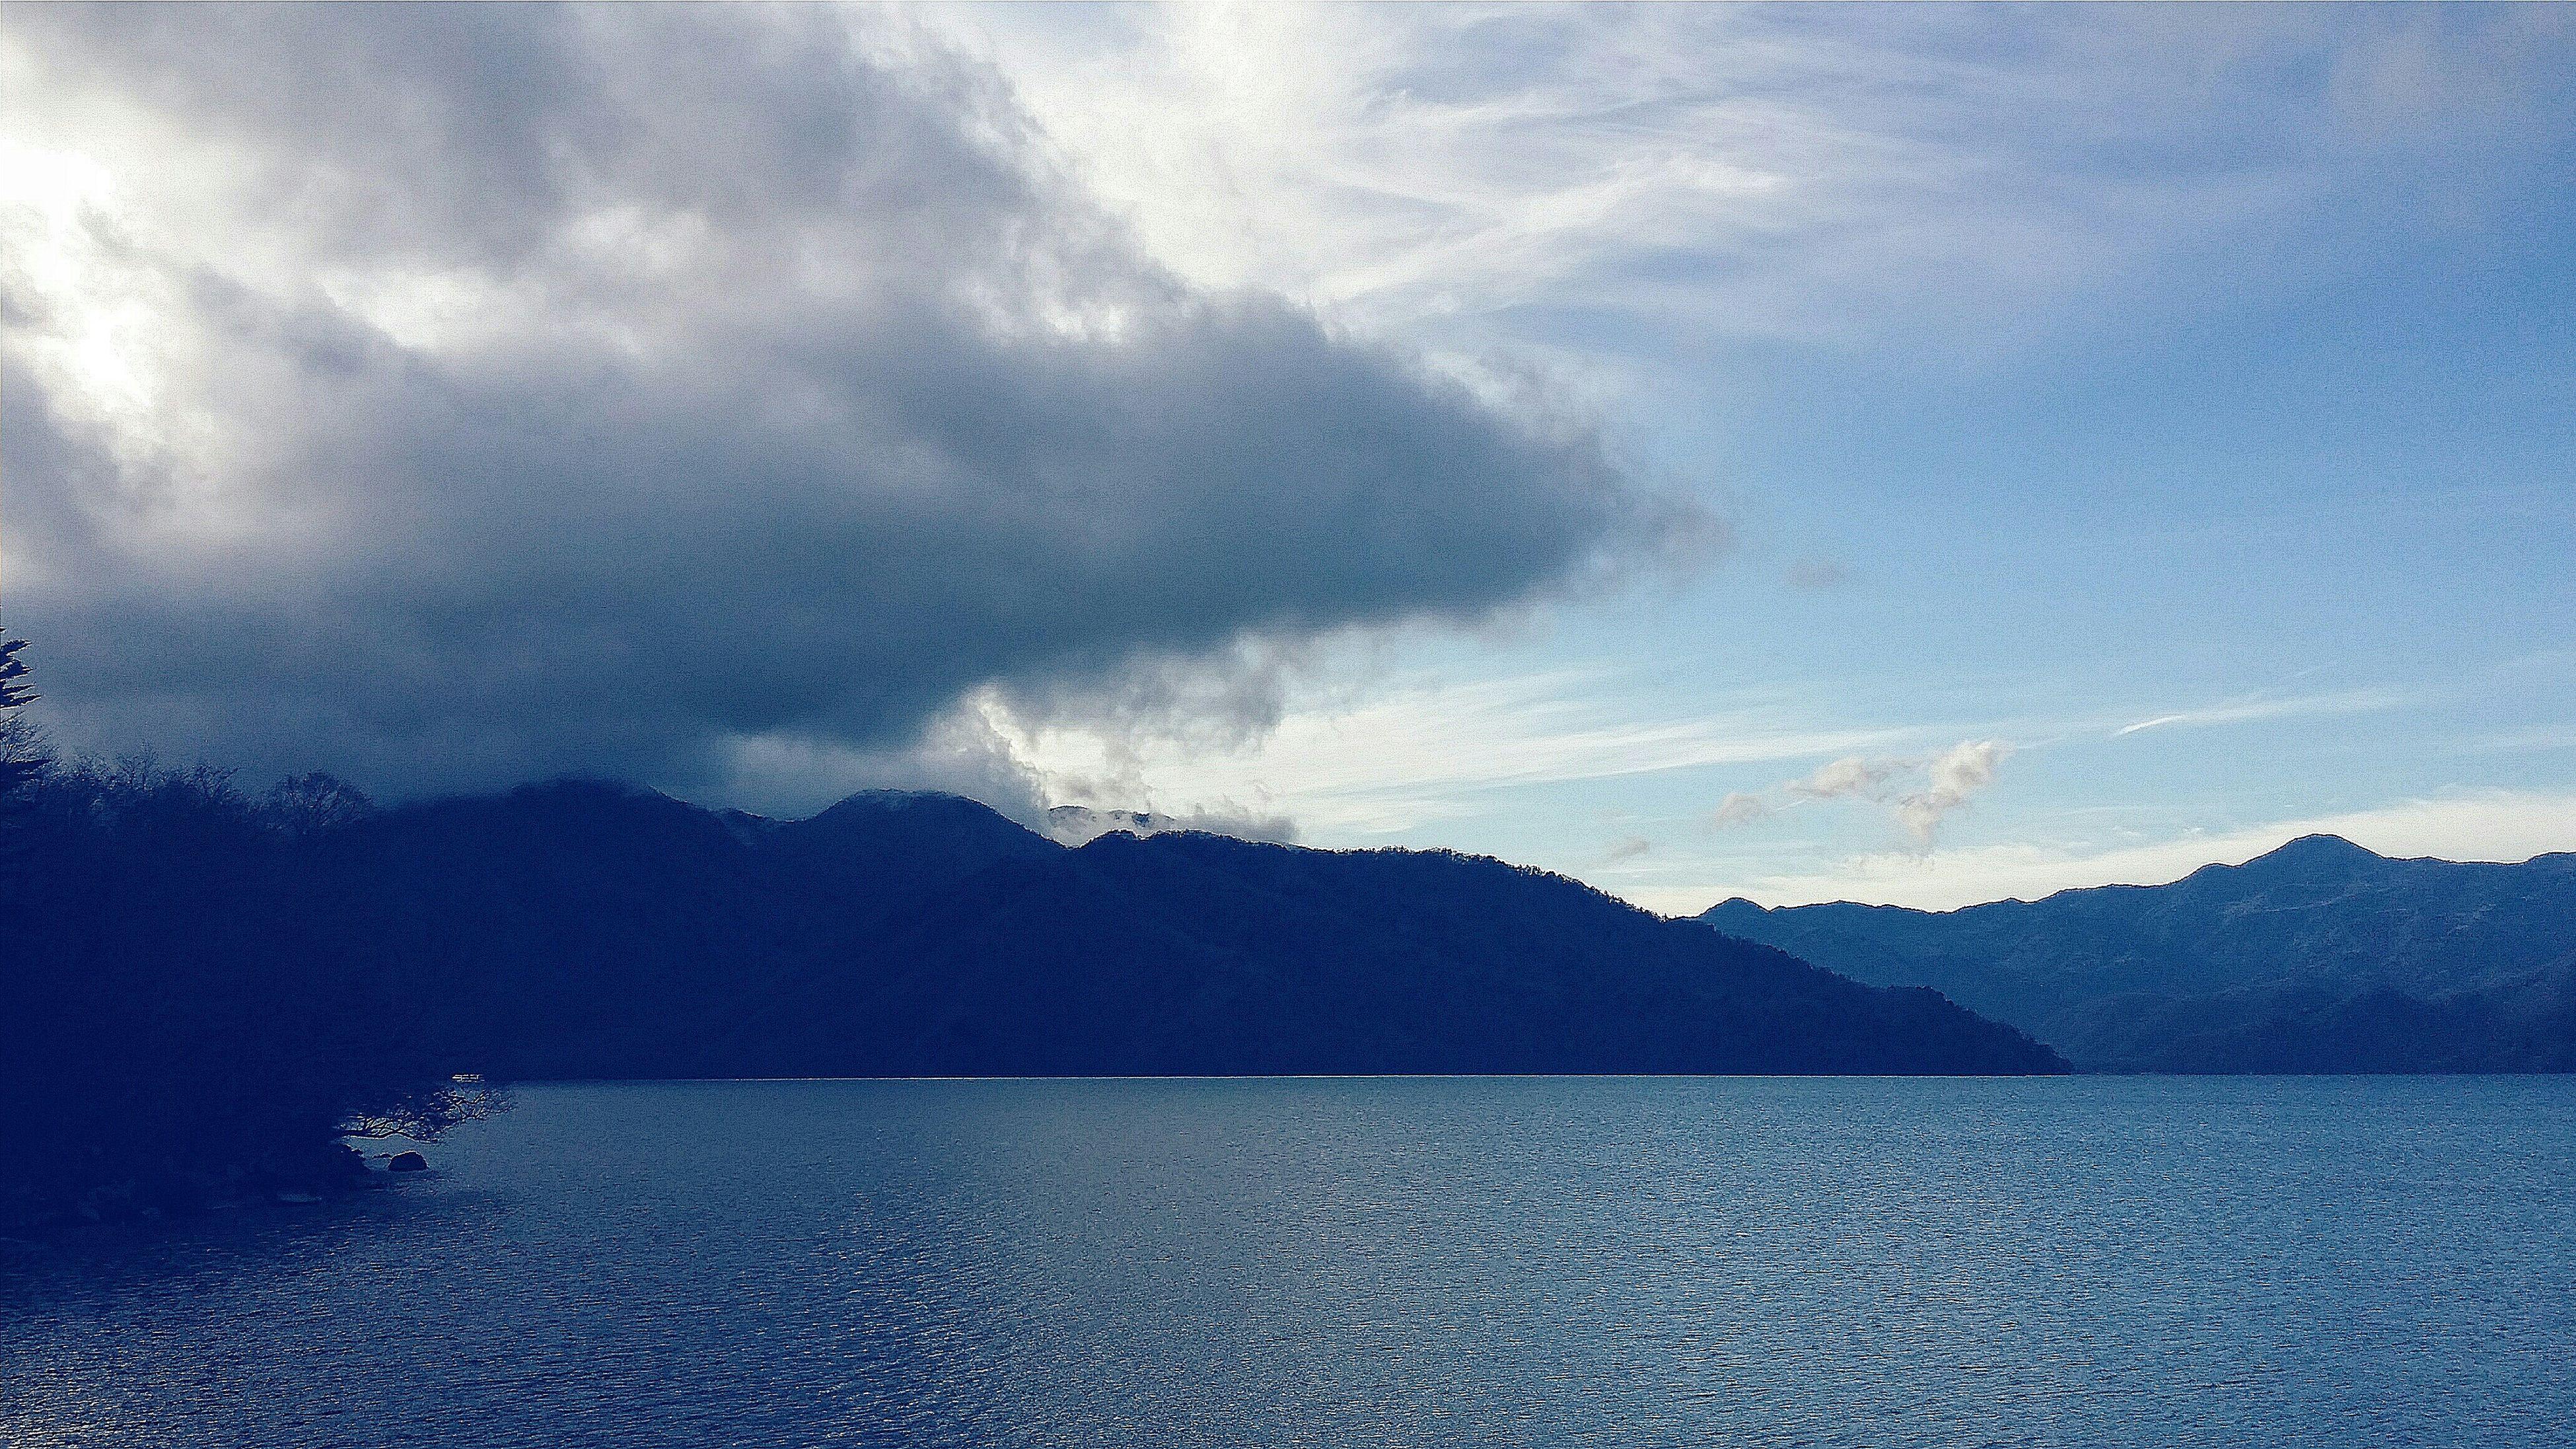 Lake Chuzenji 1269m above sea level Nikko National Park Lake 163m Deep 25km in circumference Nature Naturecollection Nature Photography Naturelovers EyeEm Nature Lover Eye Em Japan Japan Travelphotography